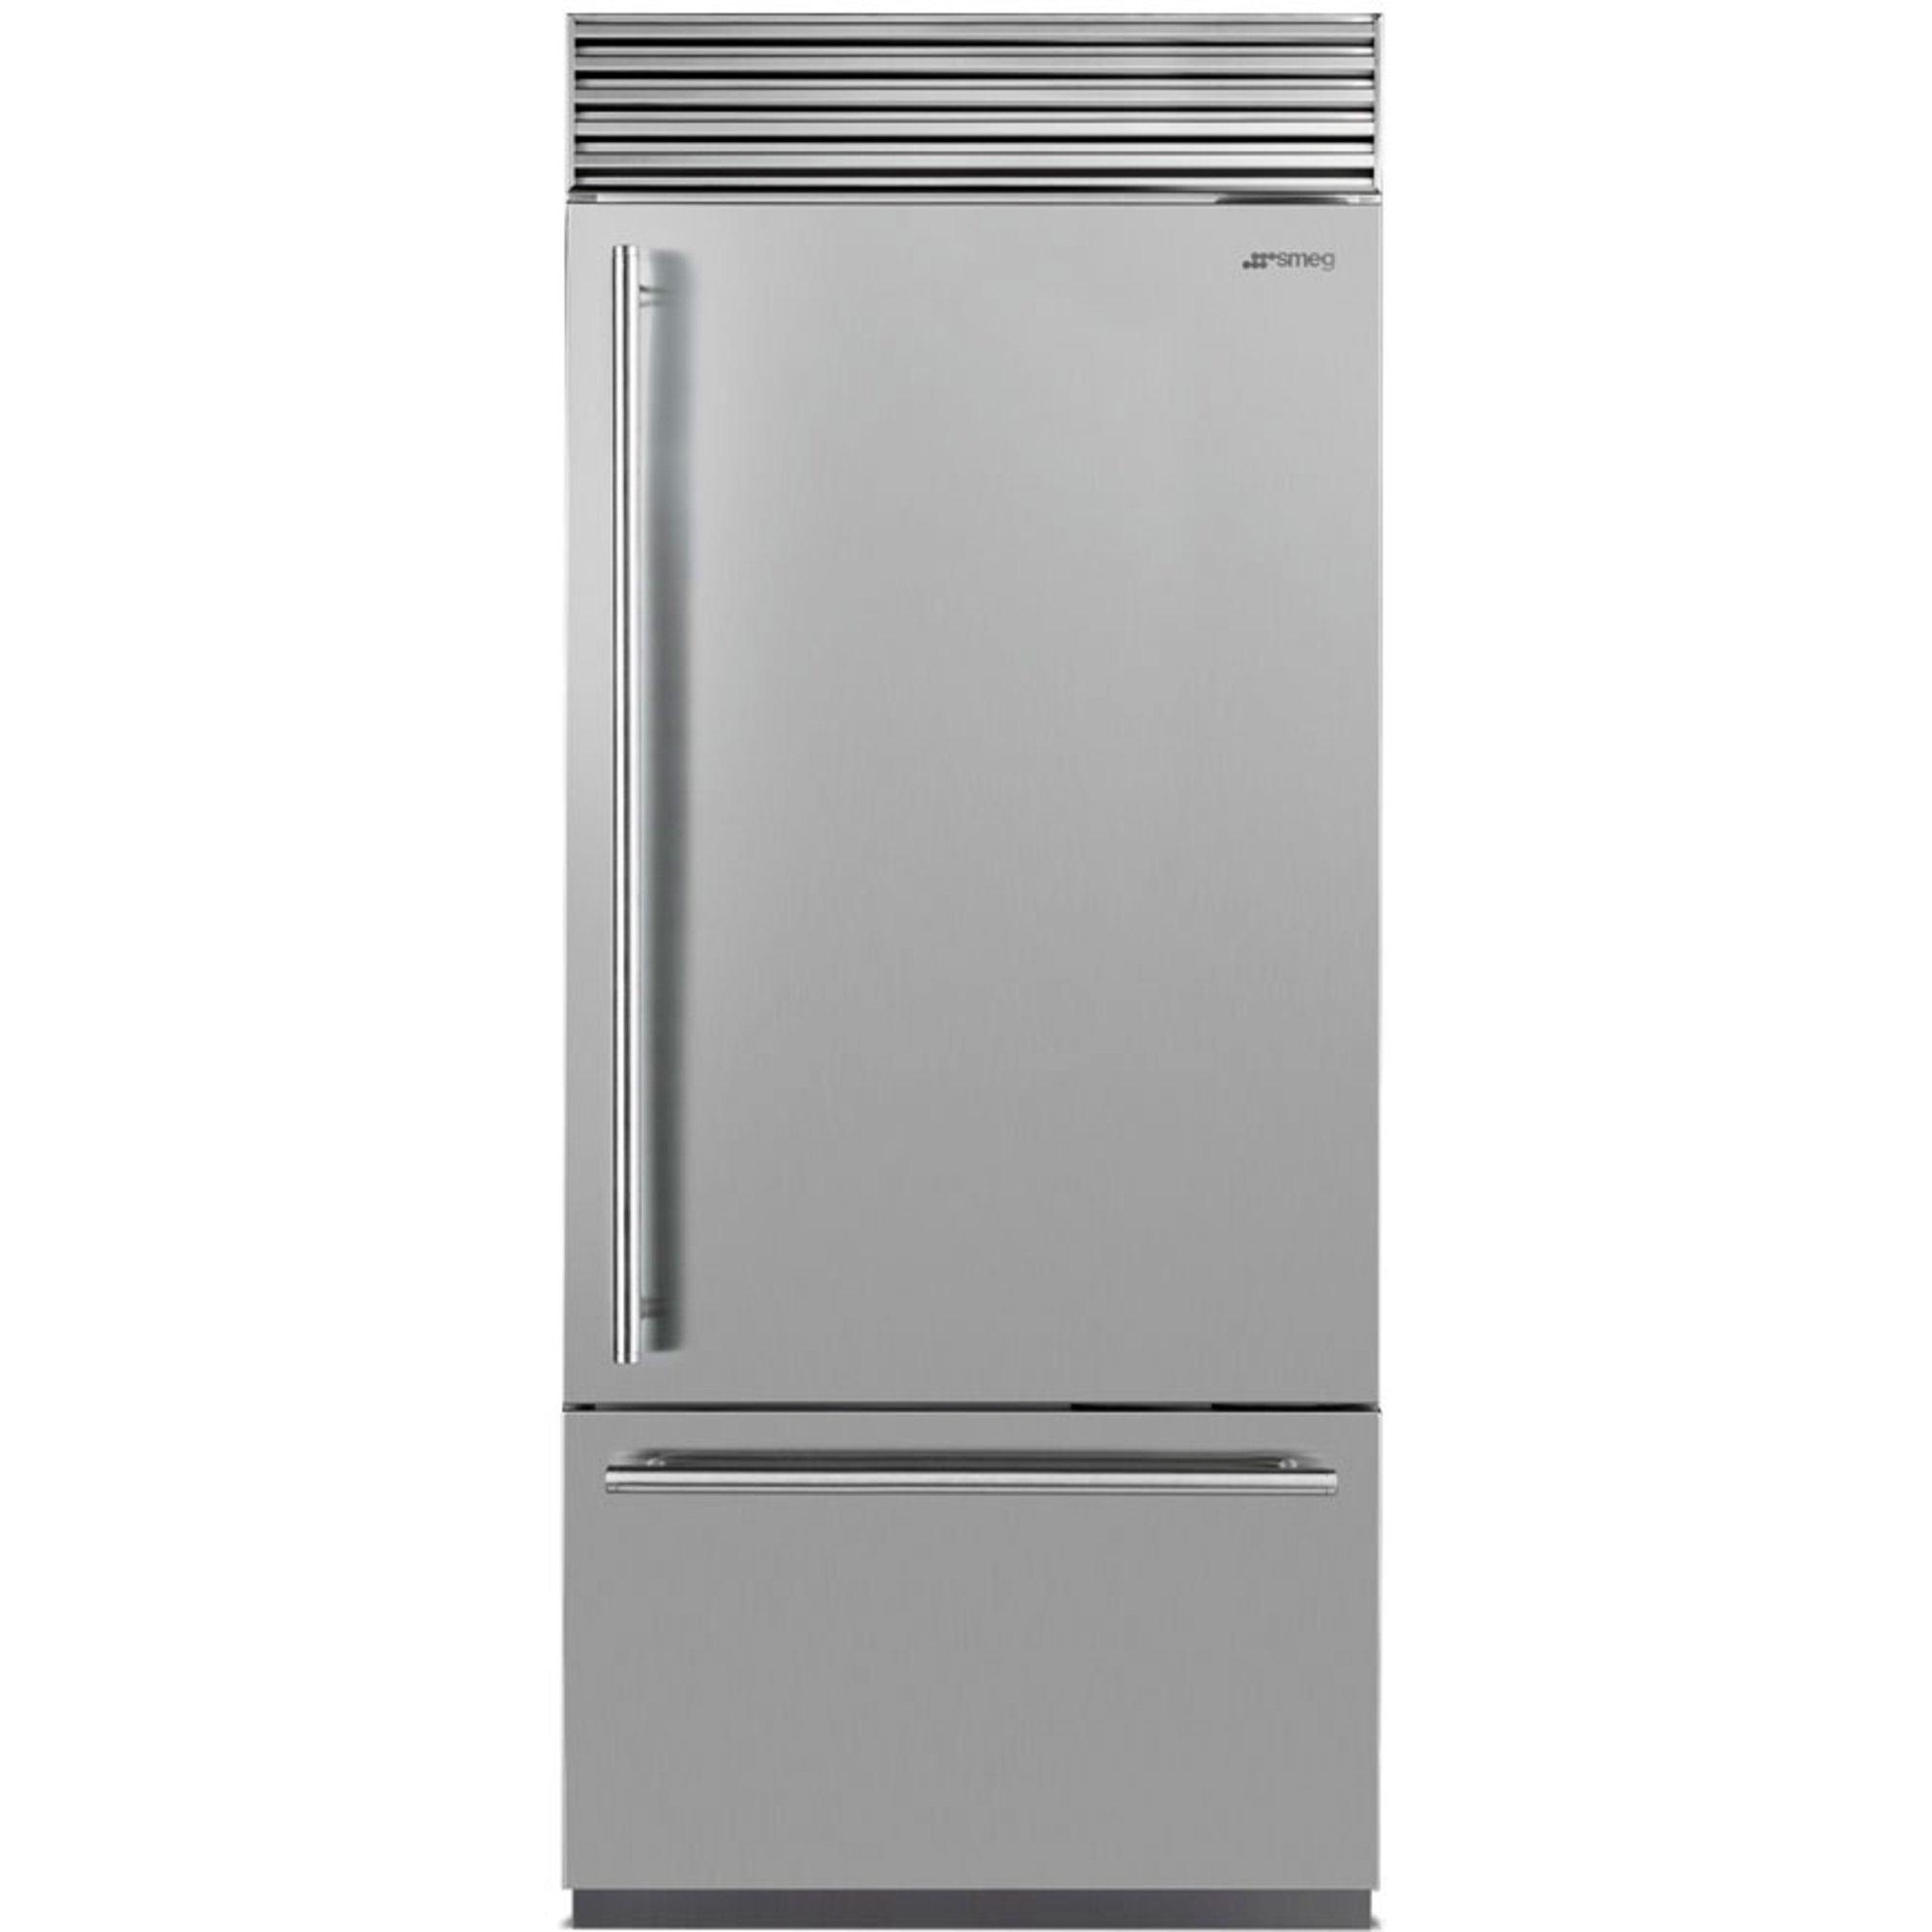 Smeg RF396RSIX Køle-/fryseskab højrehængt